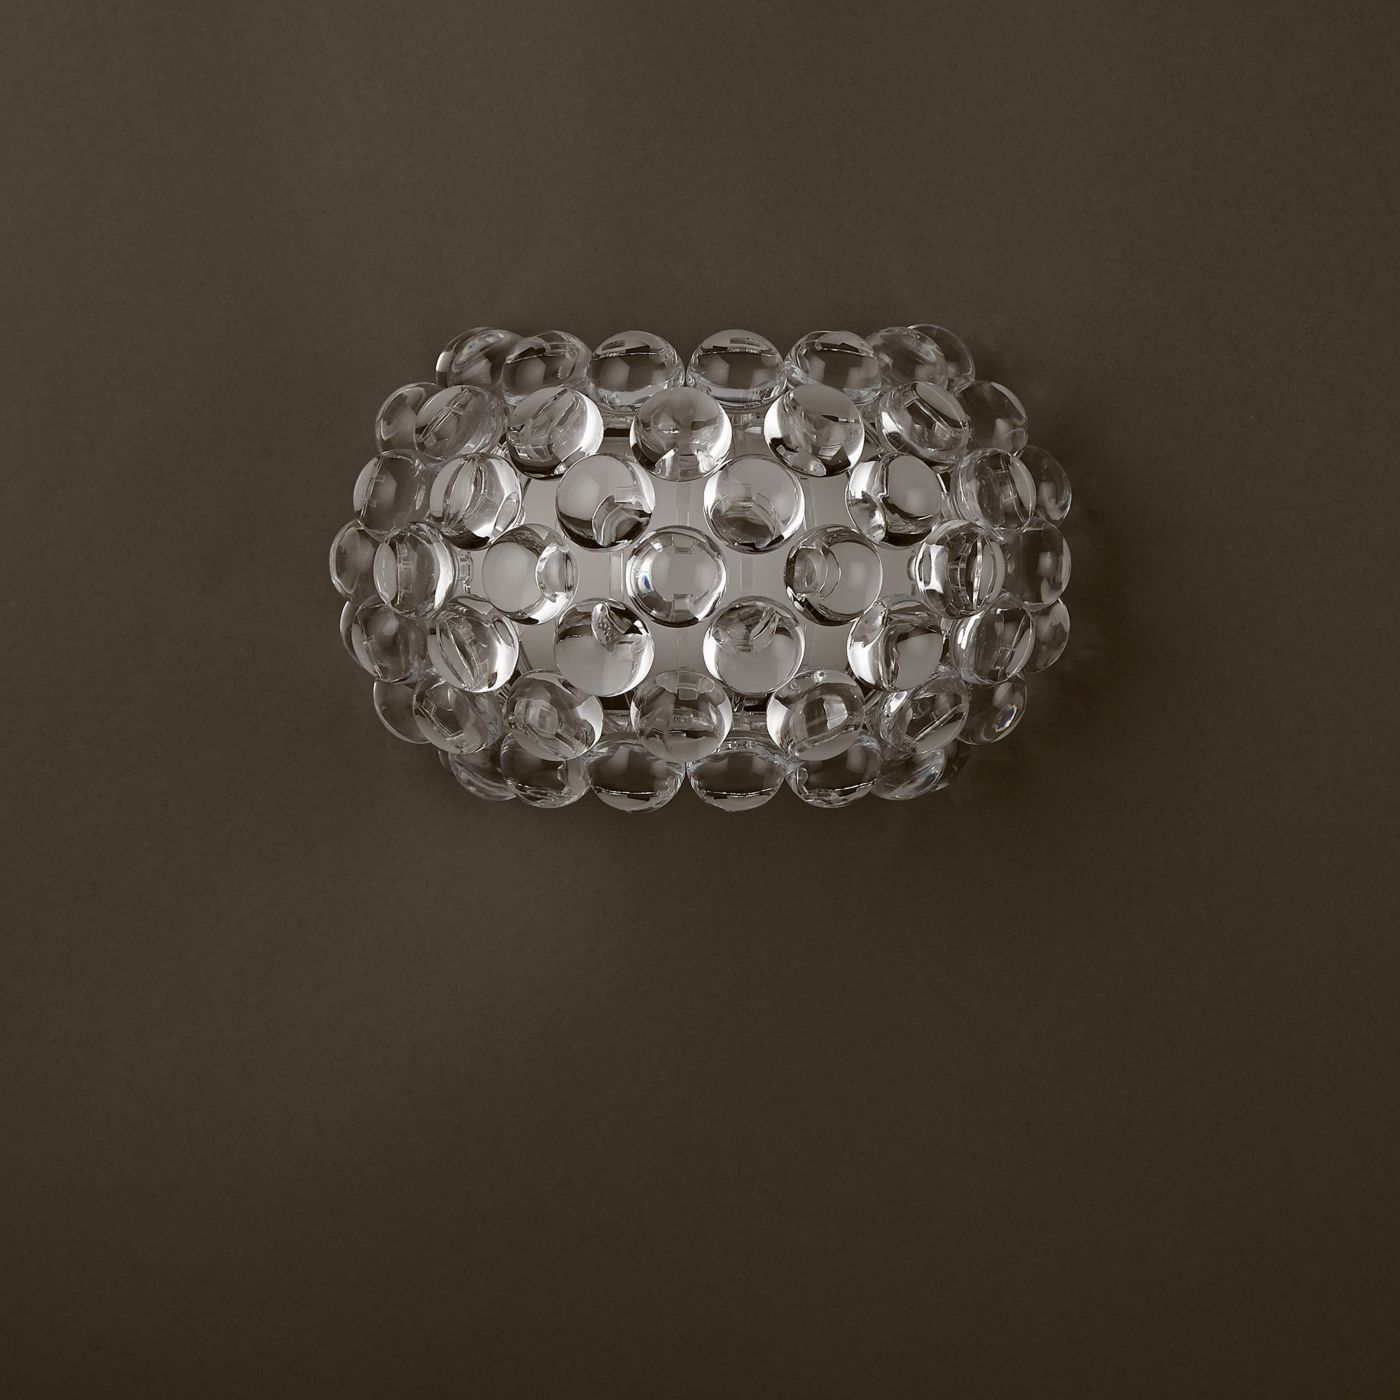 Foscarini caboche parete piccola wall lights light11 audiocablefo